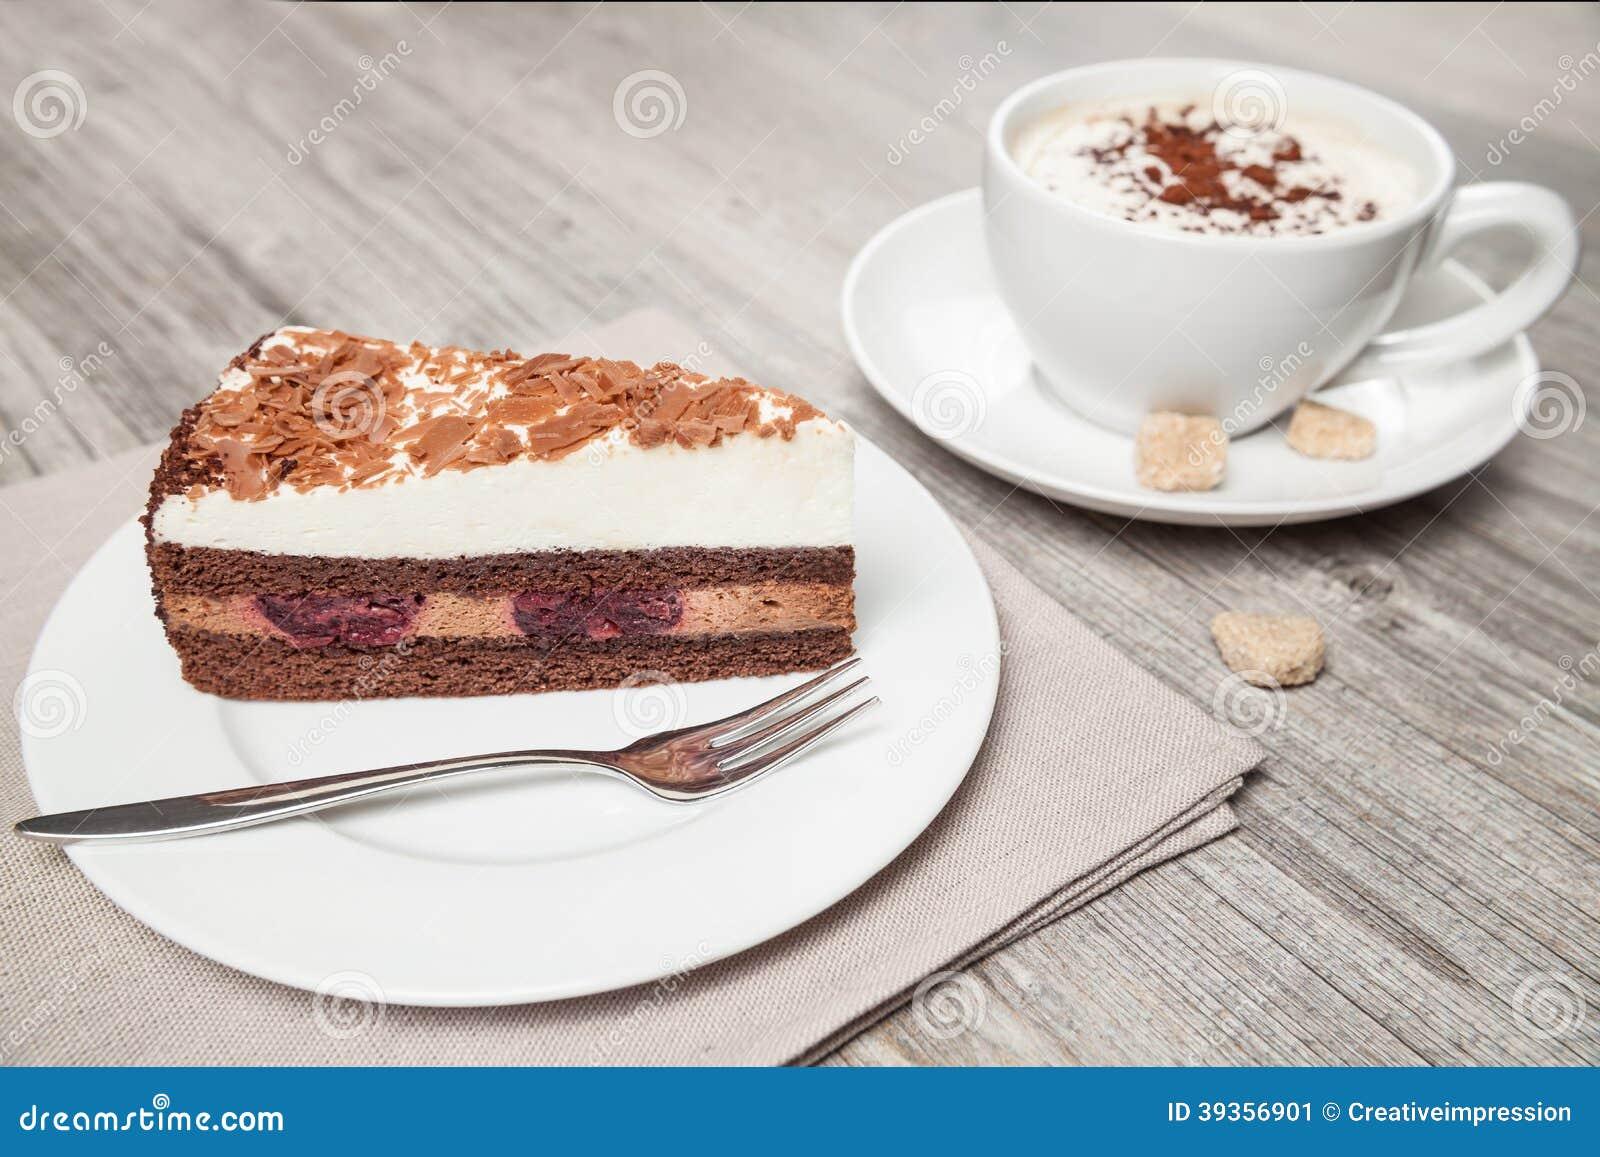 Cake And Coffee Stock Photo Image 39356901